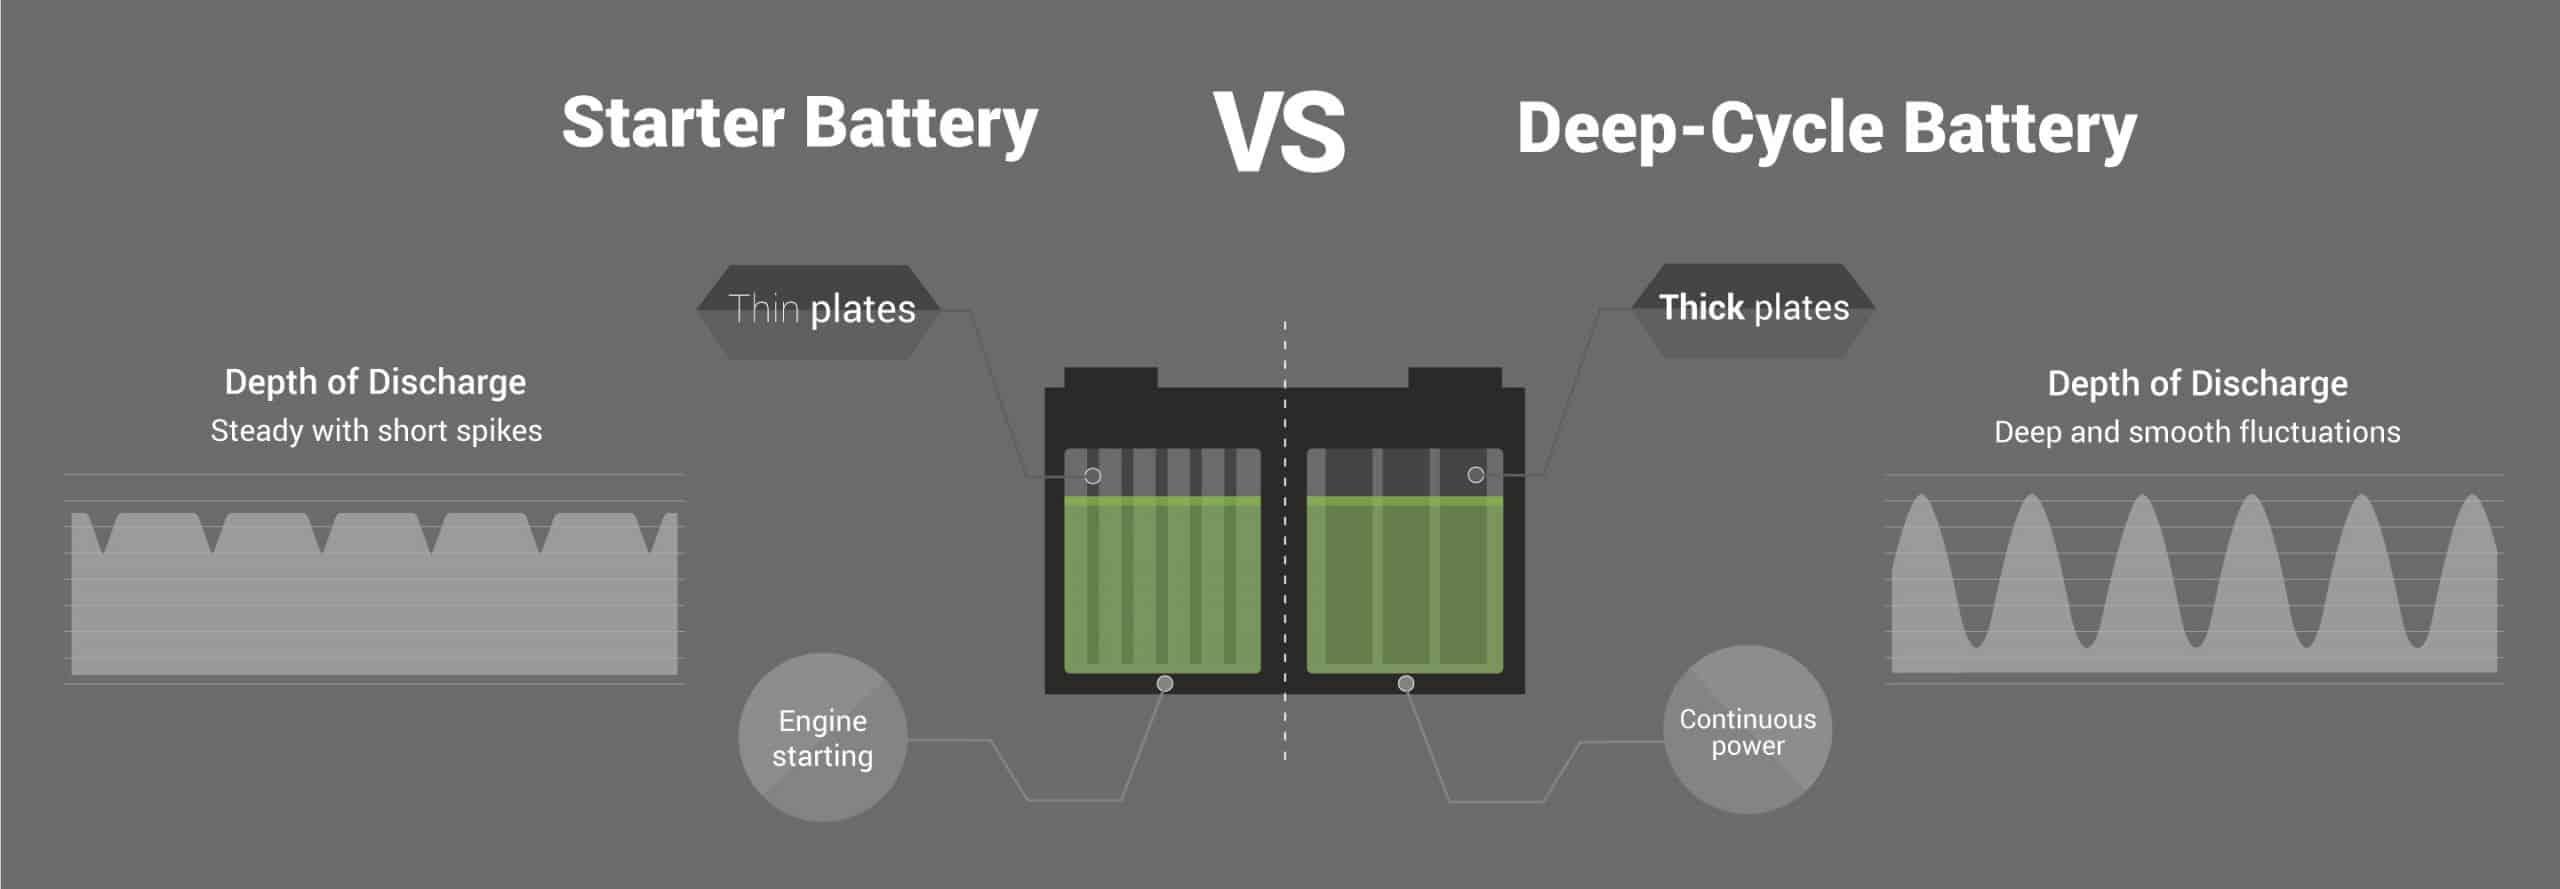 Deep cycle battery vs starter battery